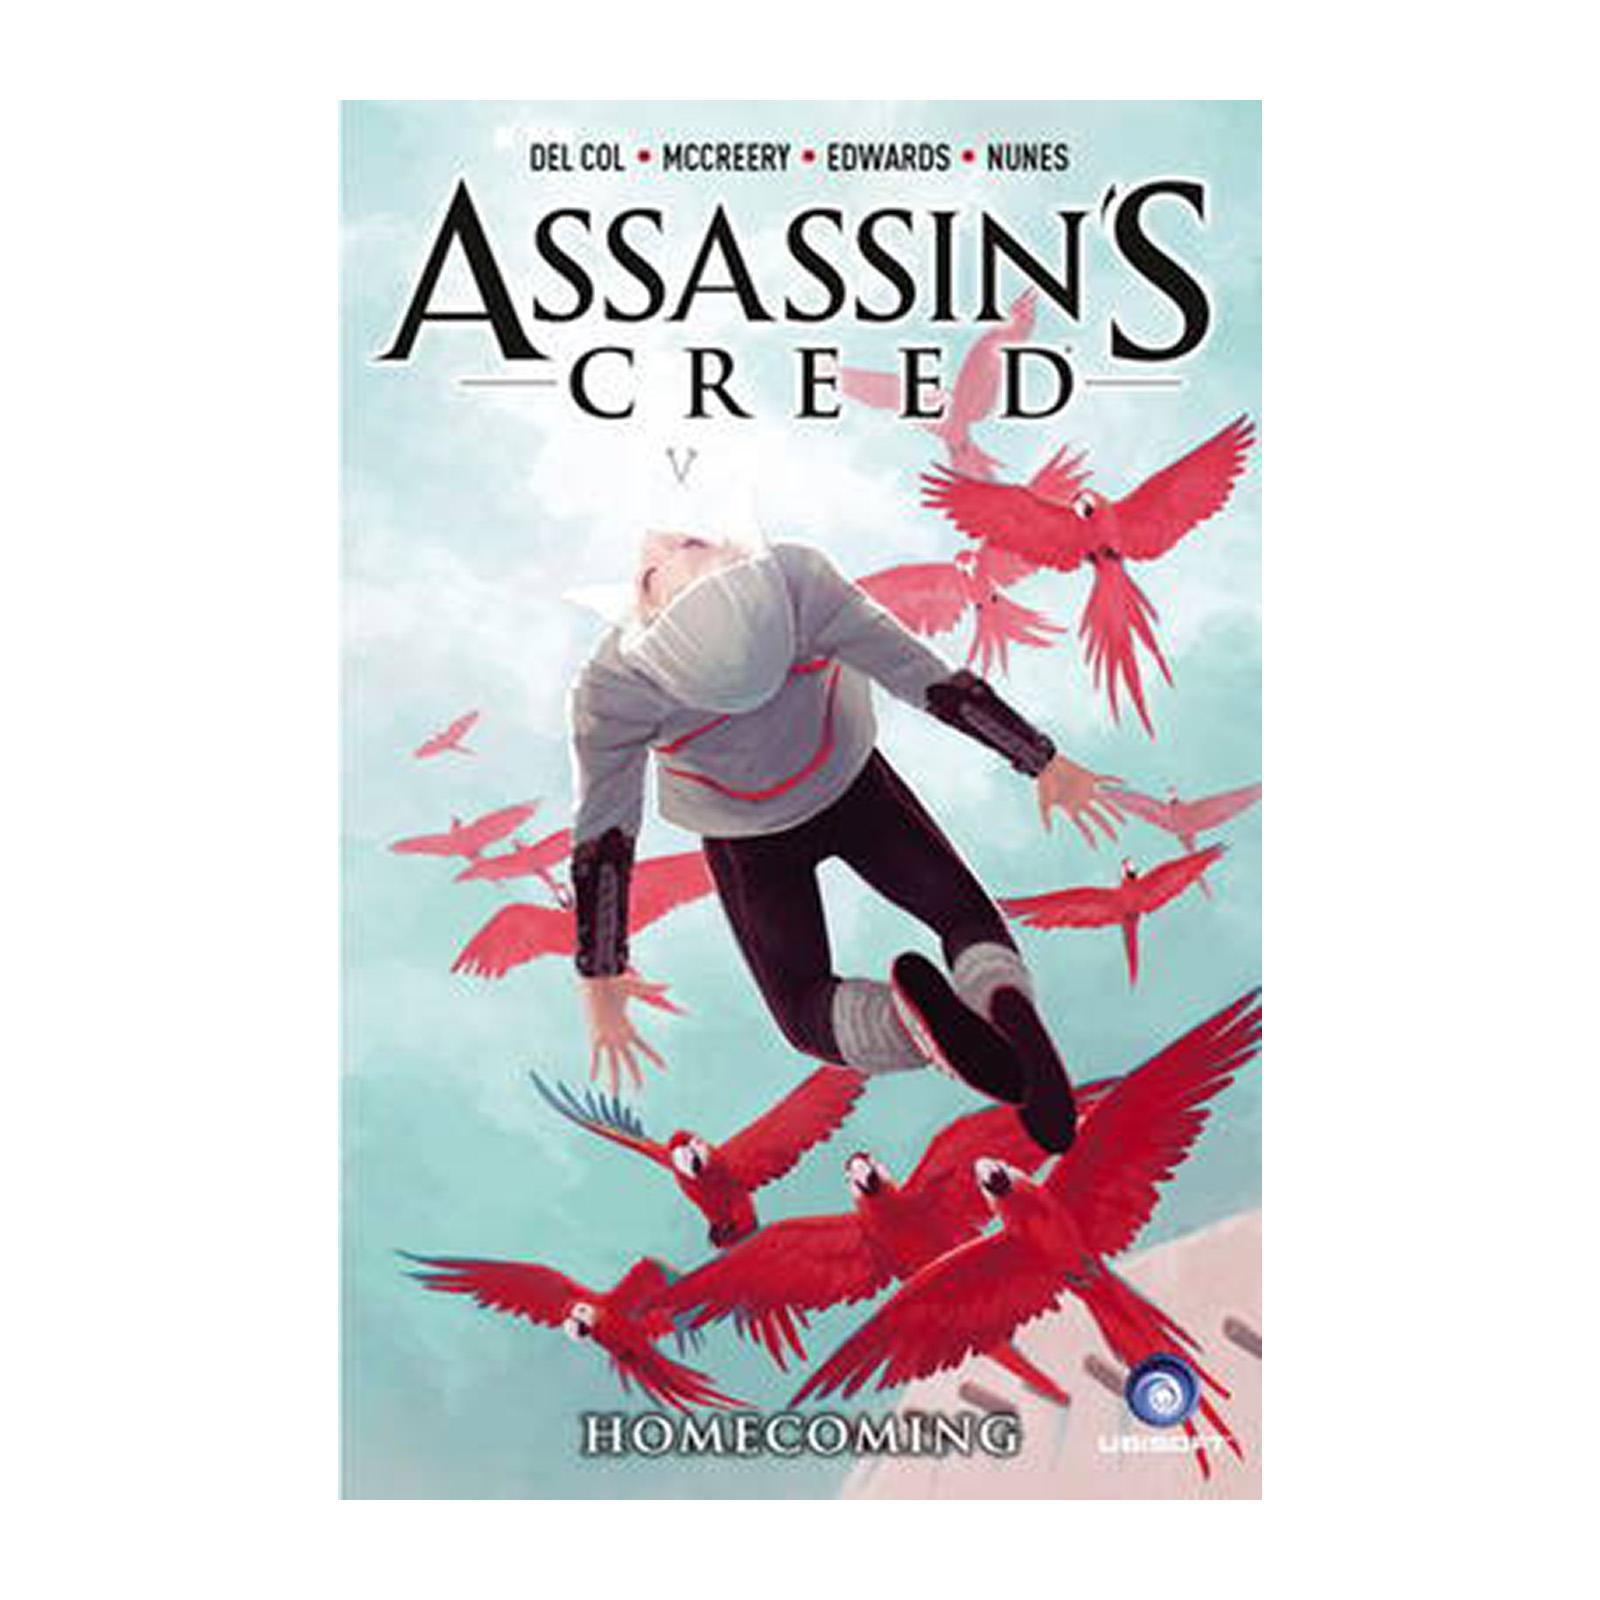 Assassins Creed: Homecoming (Paperback)